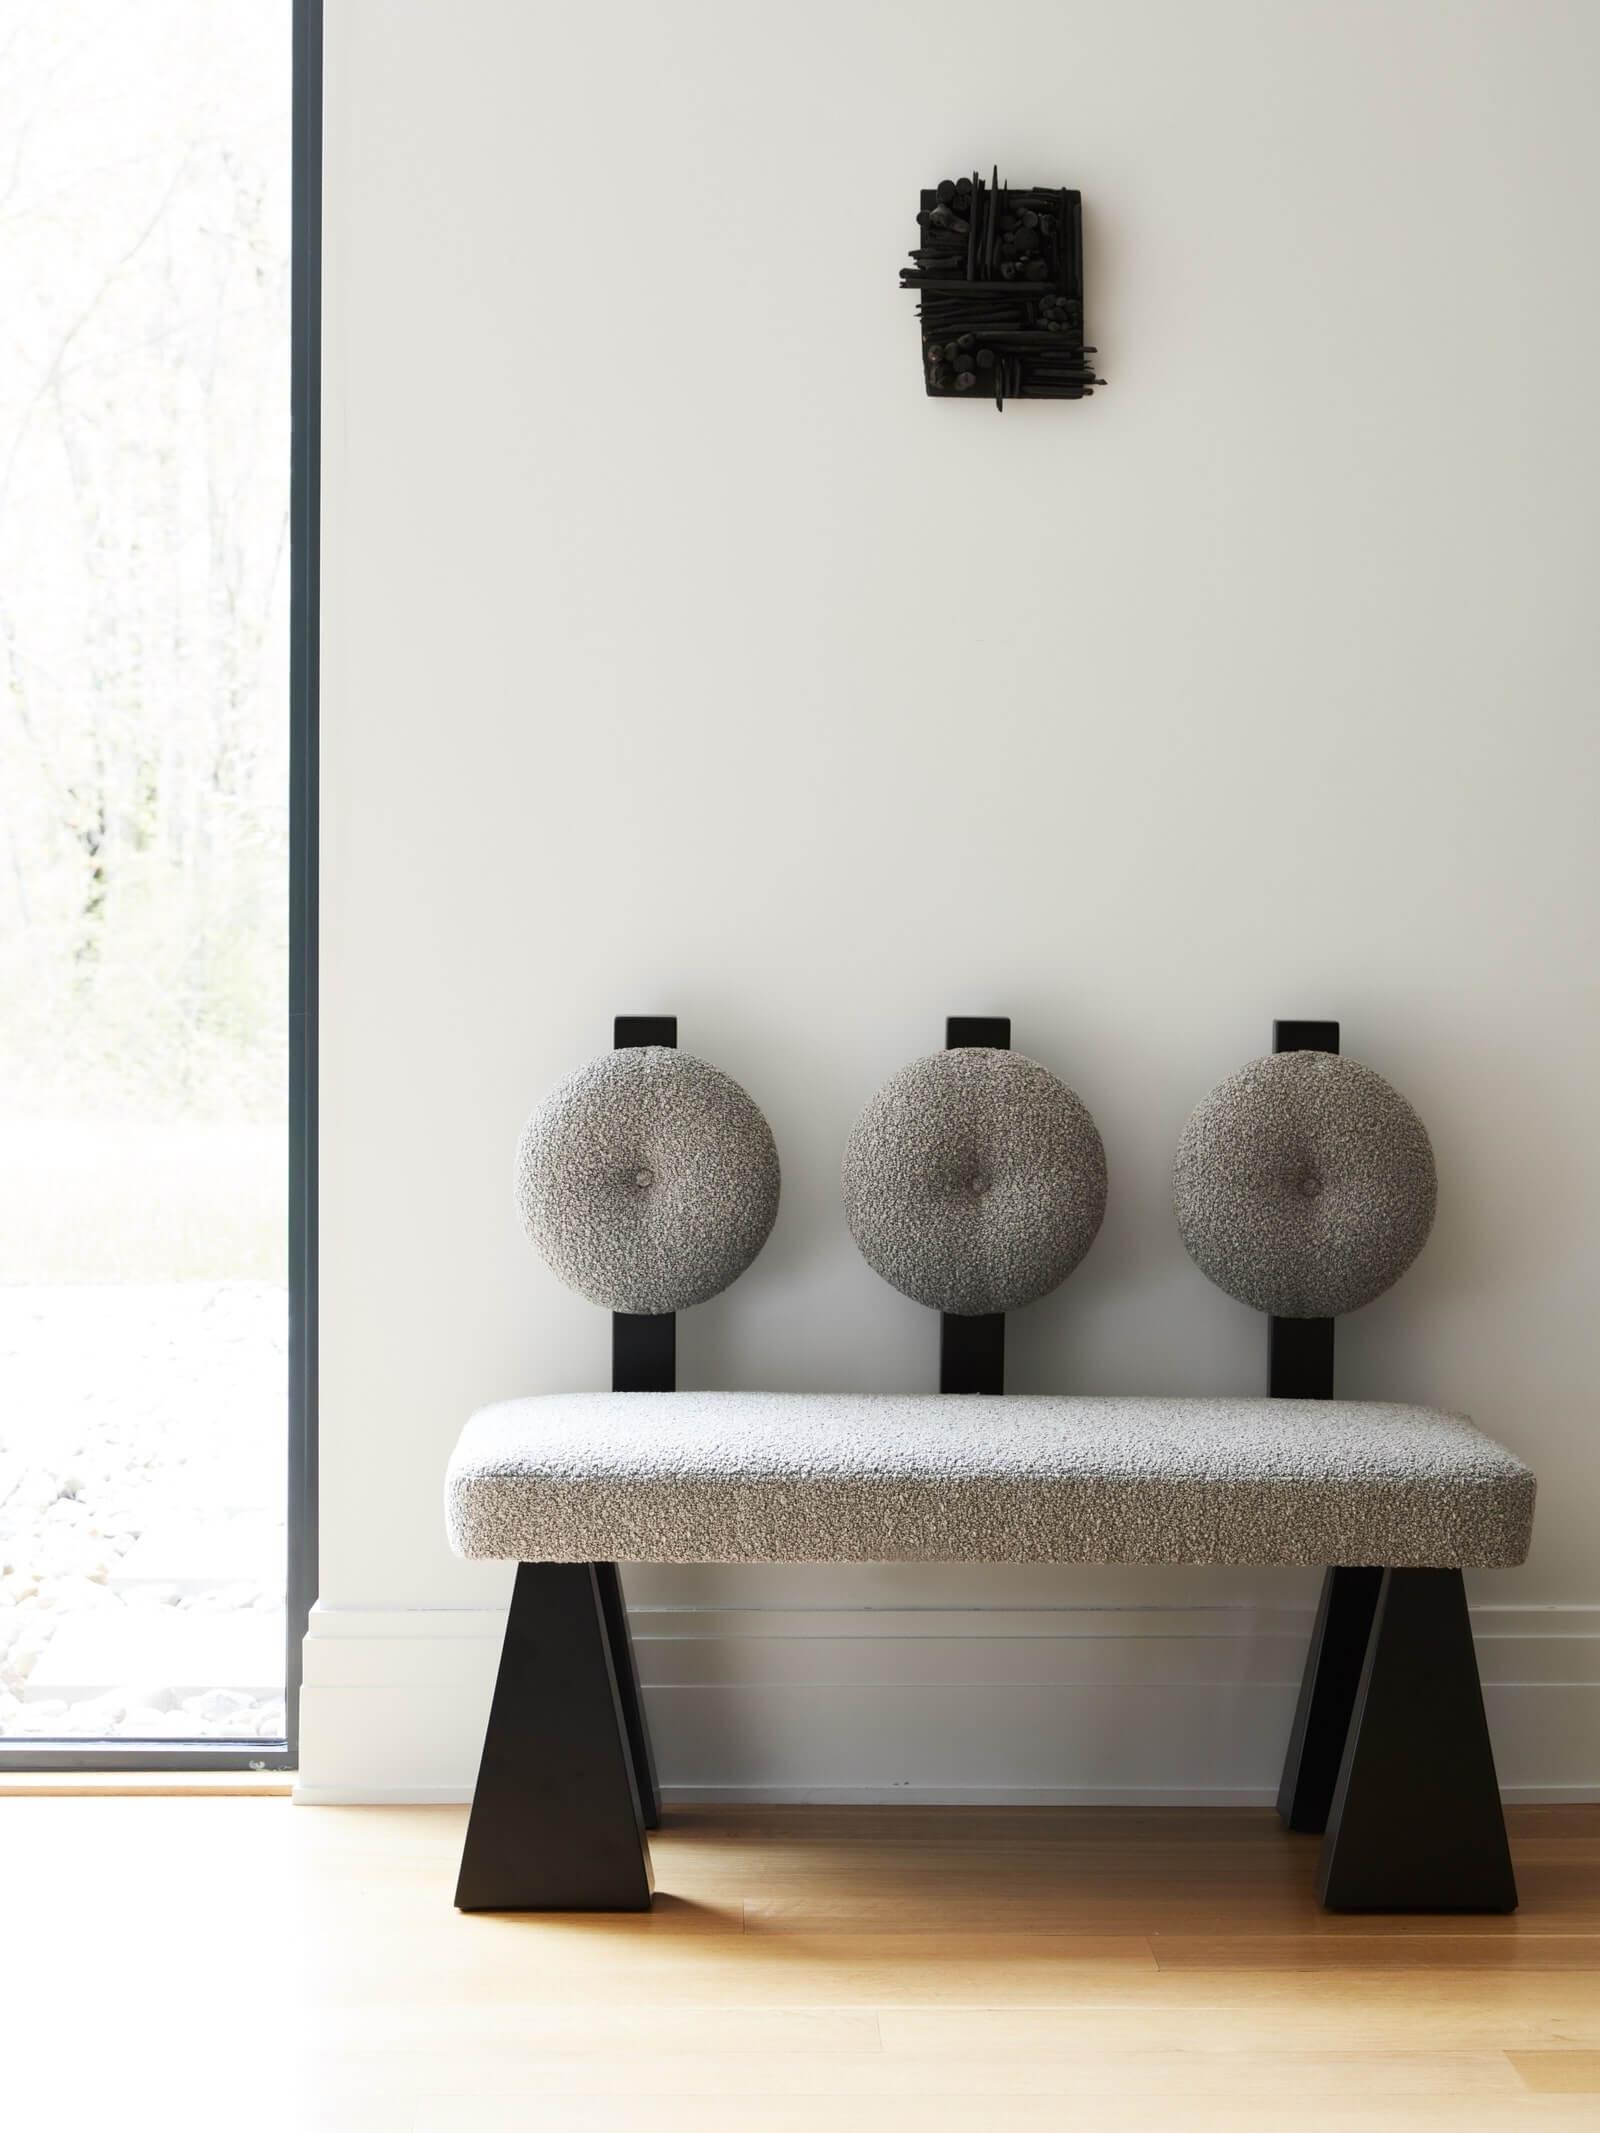 210504 TLenz Siriano Furniture3830